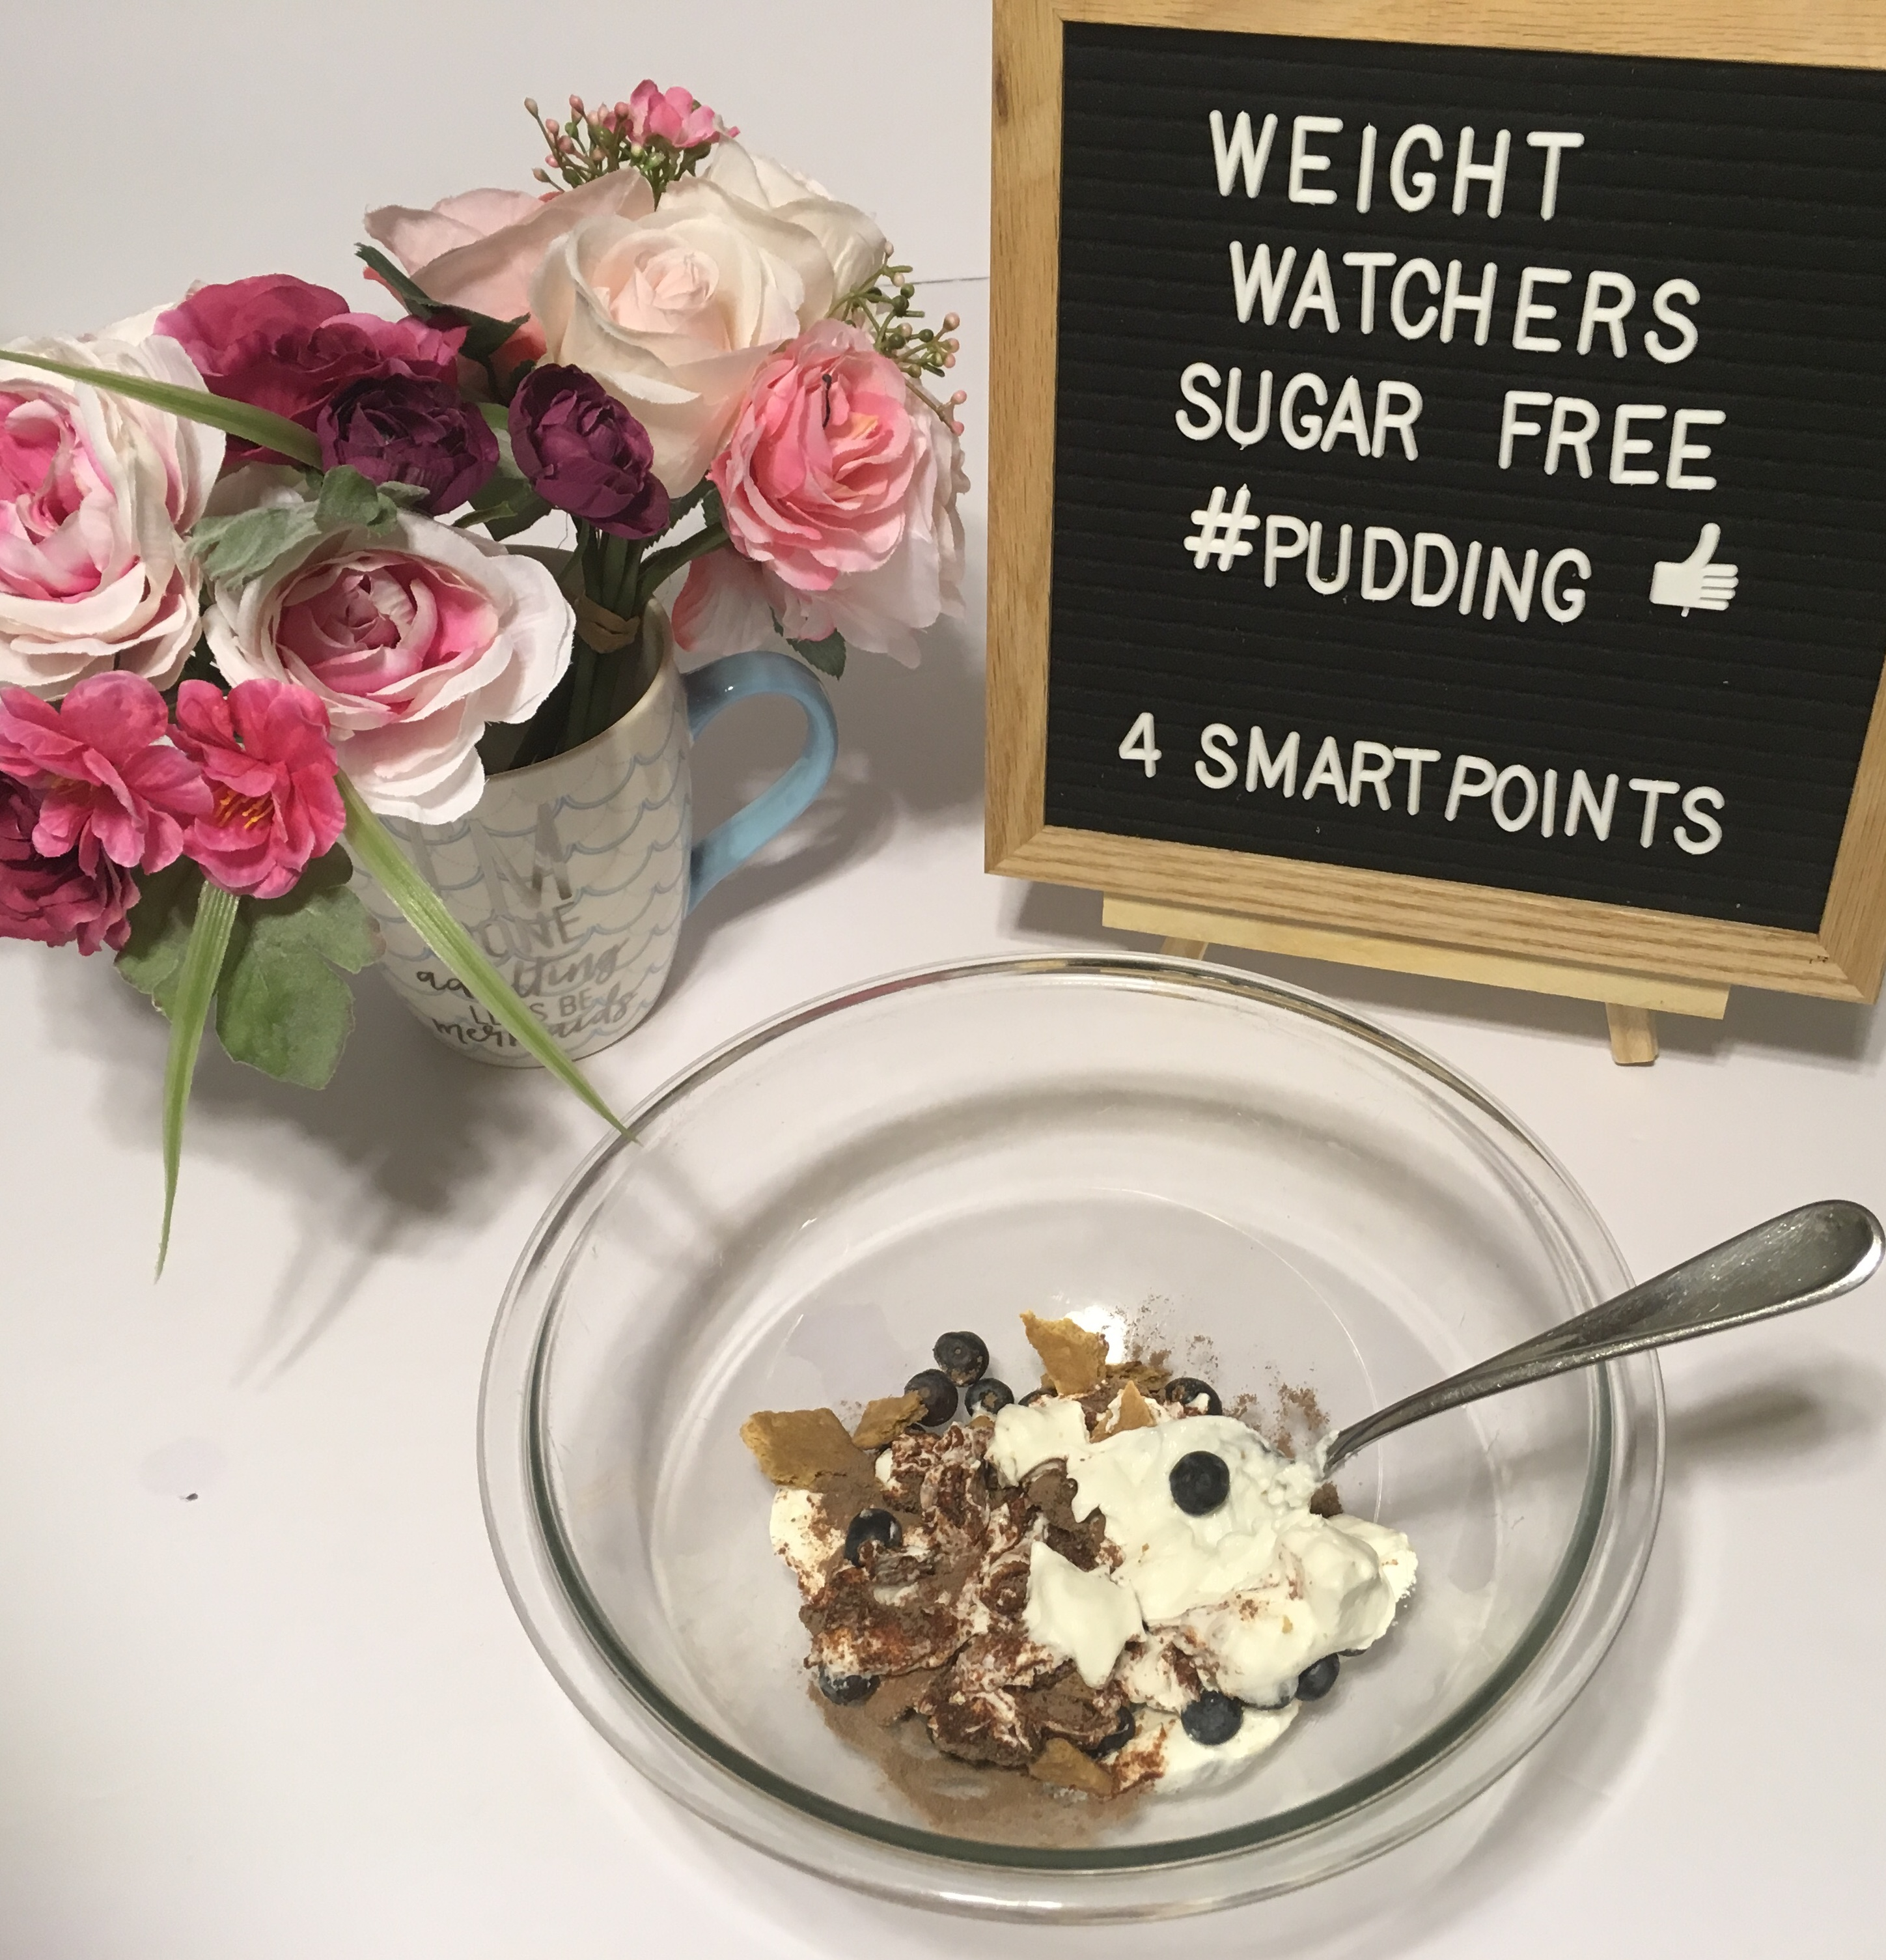 Weight Watchers Sugar Free Pudding Recipe- Just 4 SmartPoints per serving